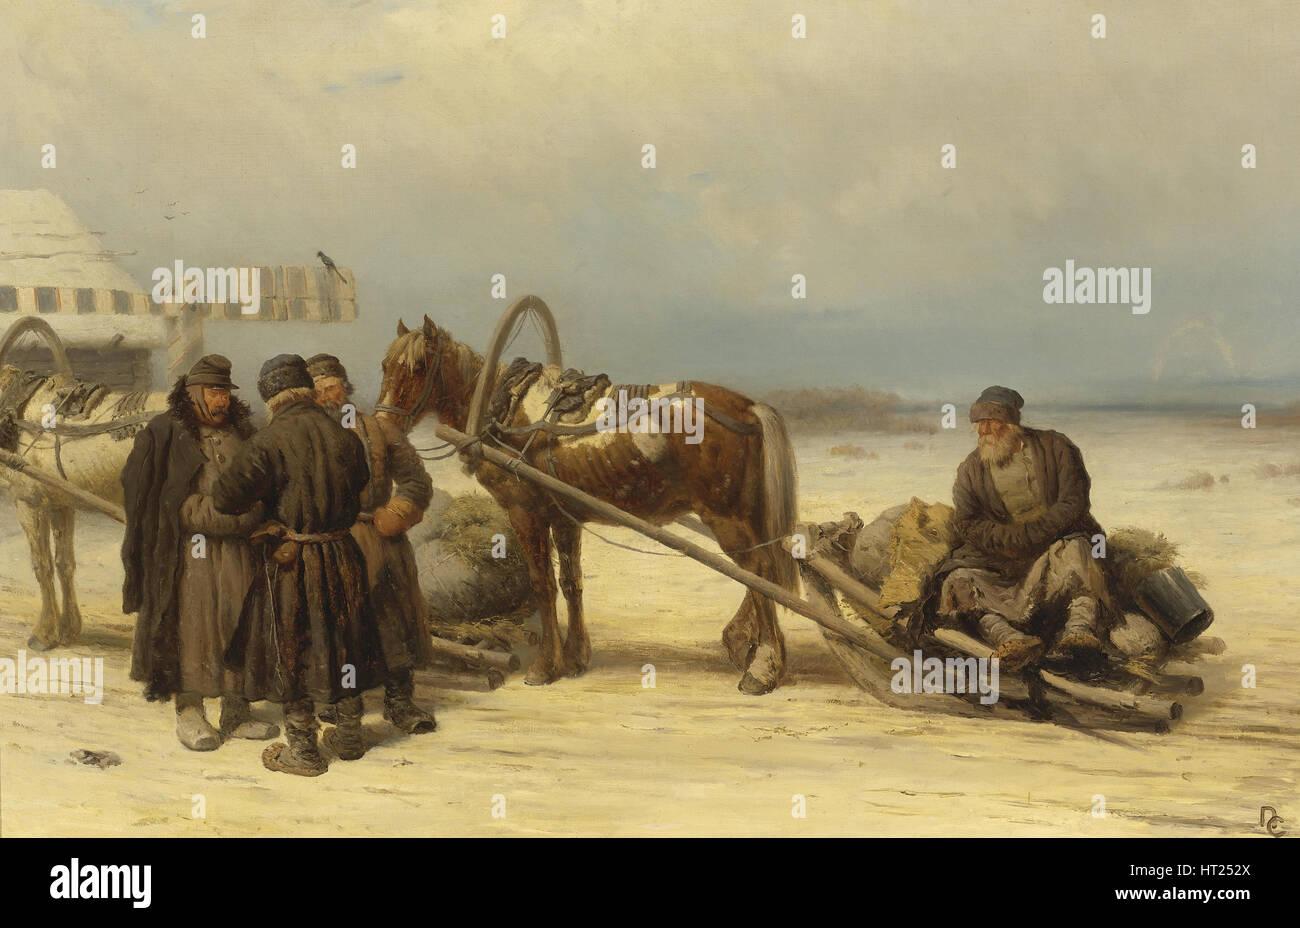 At the Gates. Artist: Sokolov, Pyotr Petrovich (1821-1899) - Stock Image